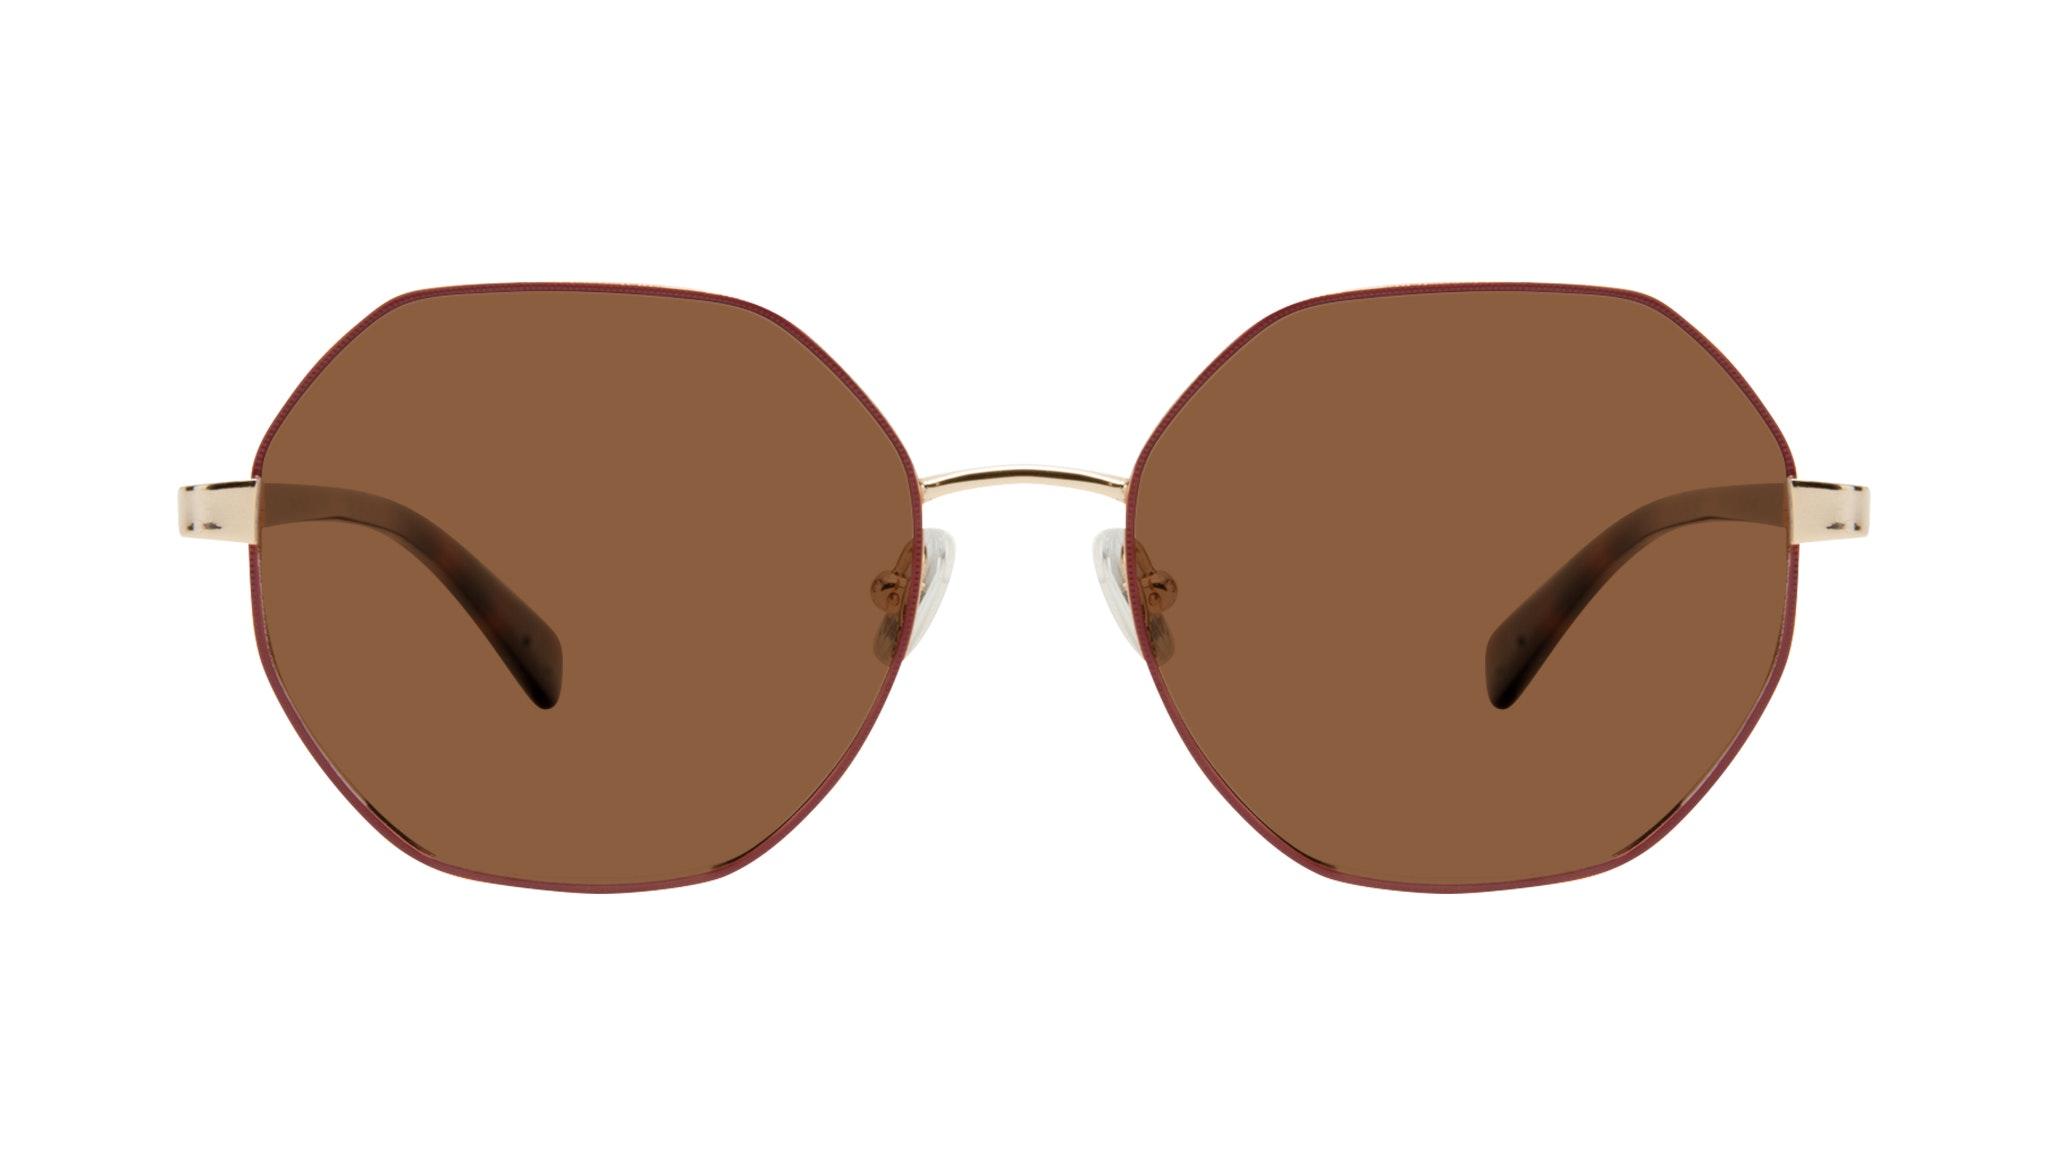 Affordable Fashion Glasses Round Sunglasses Women Fantasy Wine